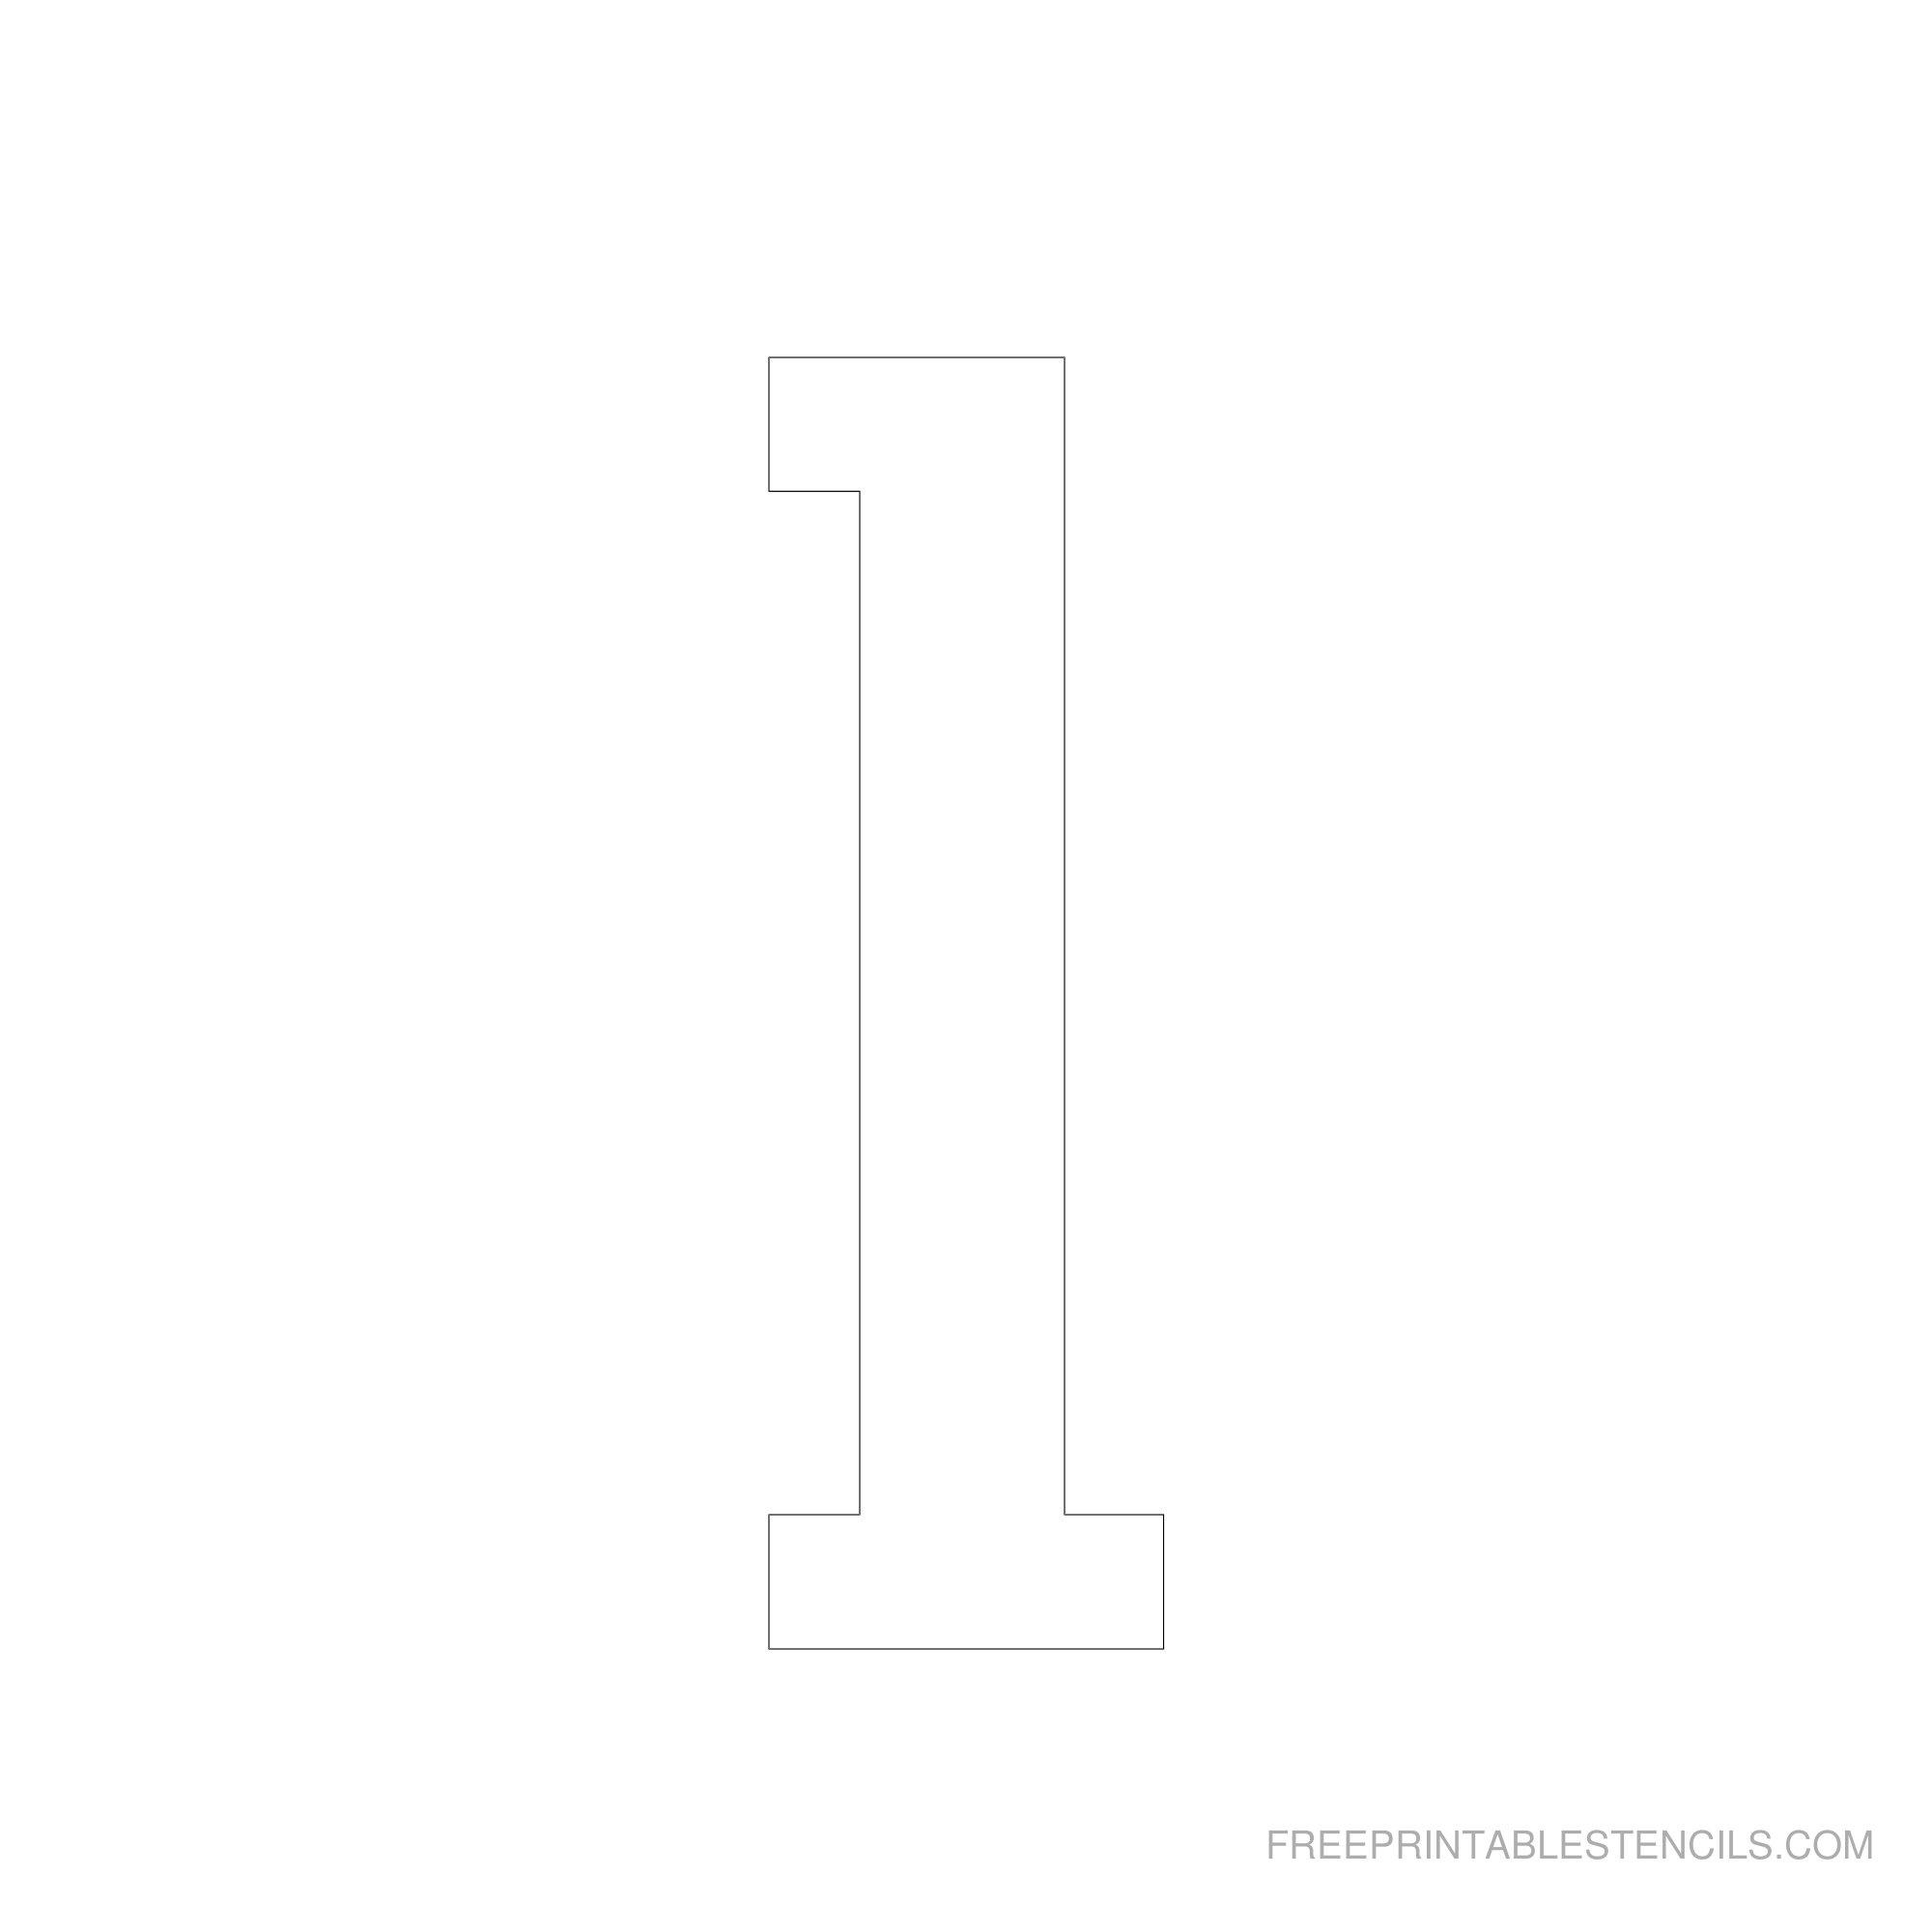 Printable 6 Inch Number Stencils 1-10 | Free Printable Stencils - One Inch Stencils Printable Free